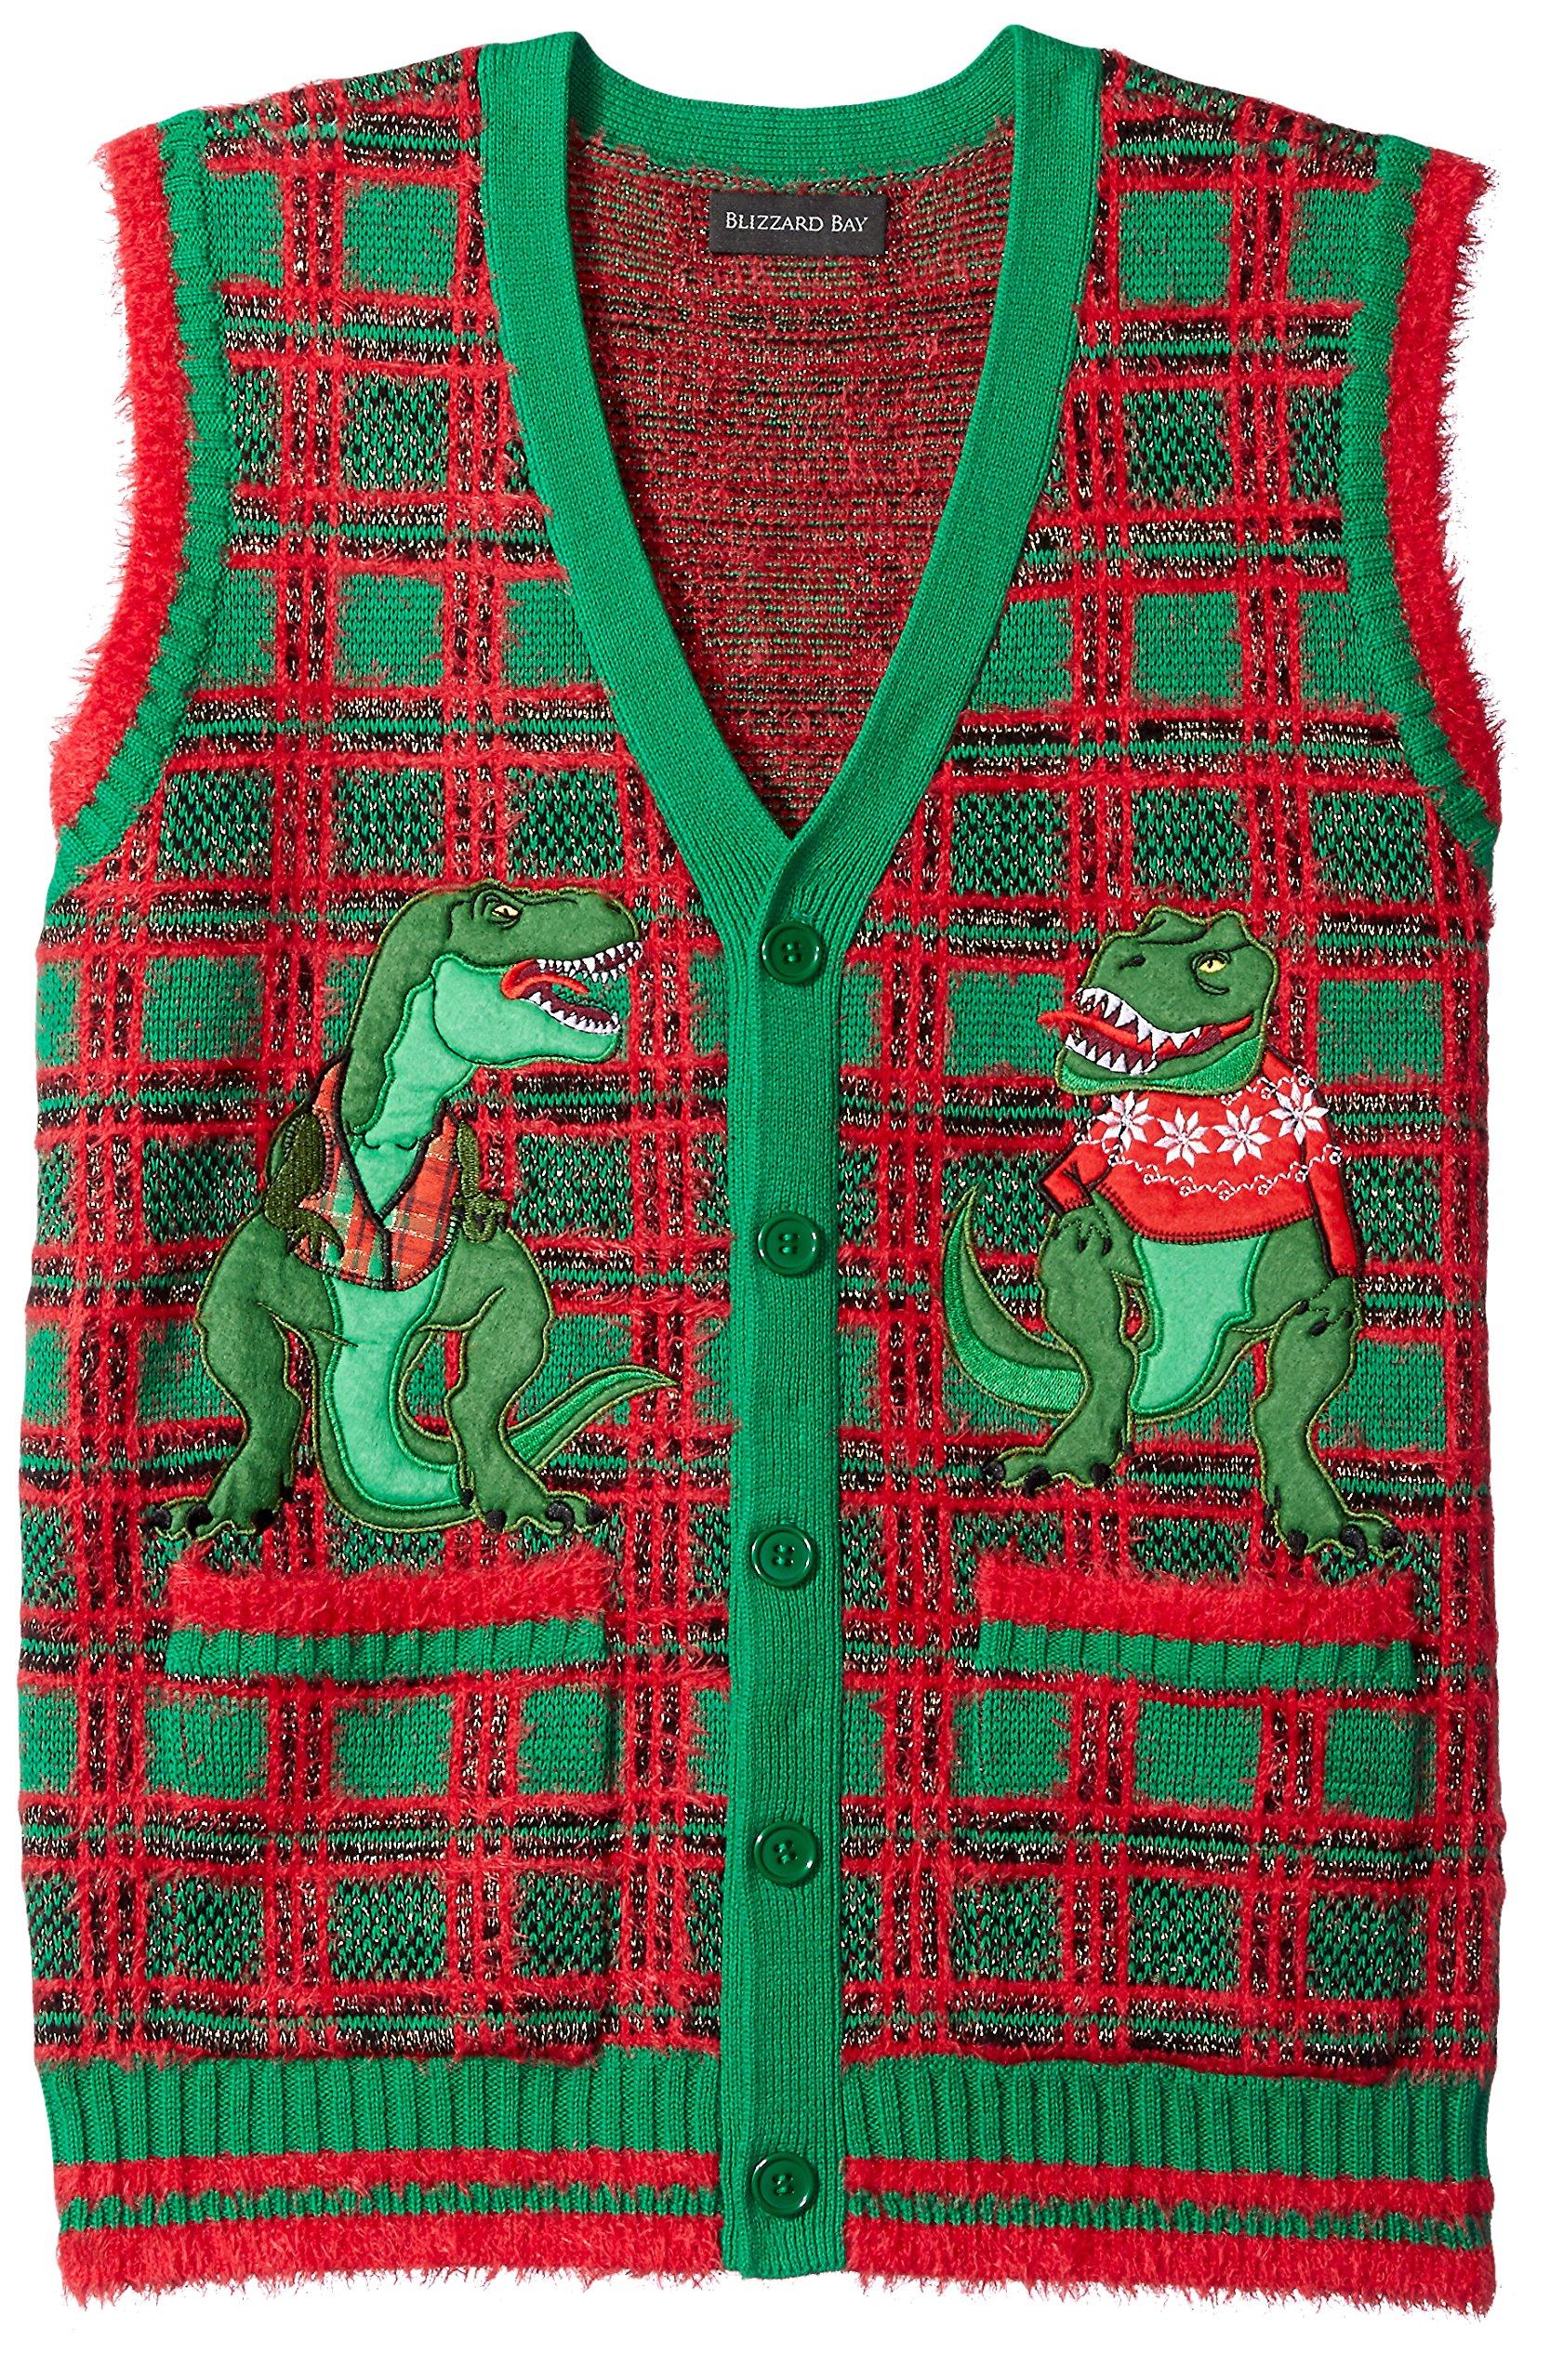 Blizzard Bay Men's Ugly Christmas Sweater Vest, Dark Green, Large by Blizzard Bay